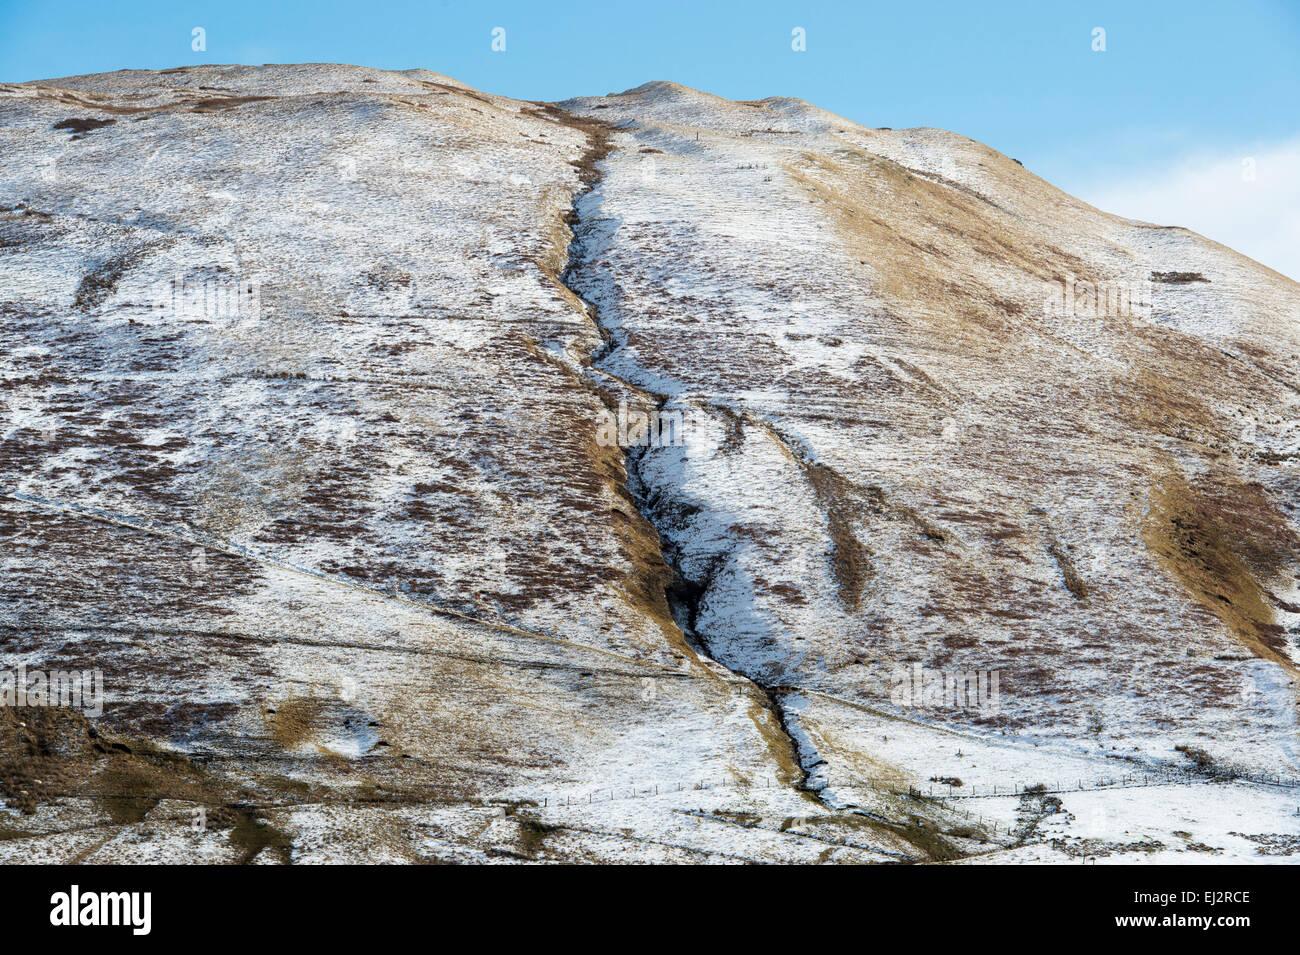 Hillside in the winter snow. Peebleshire. Scotland - Stock Image